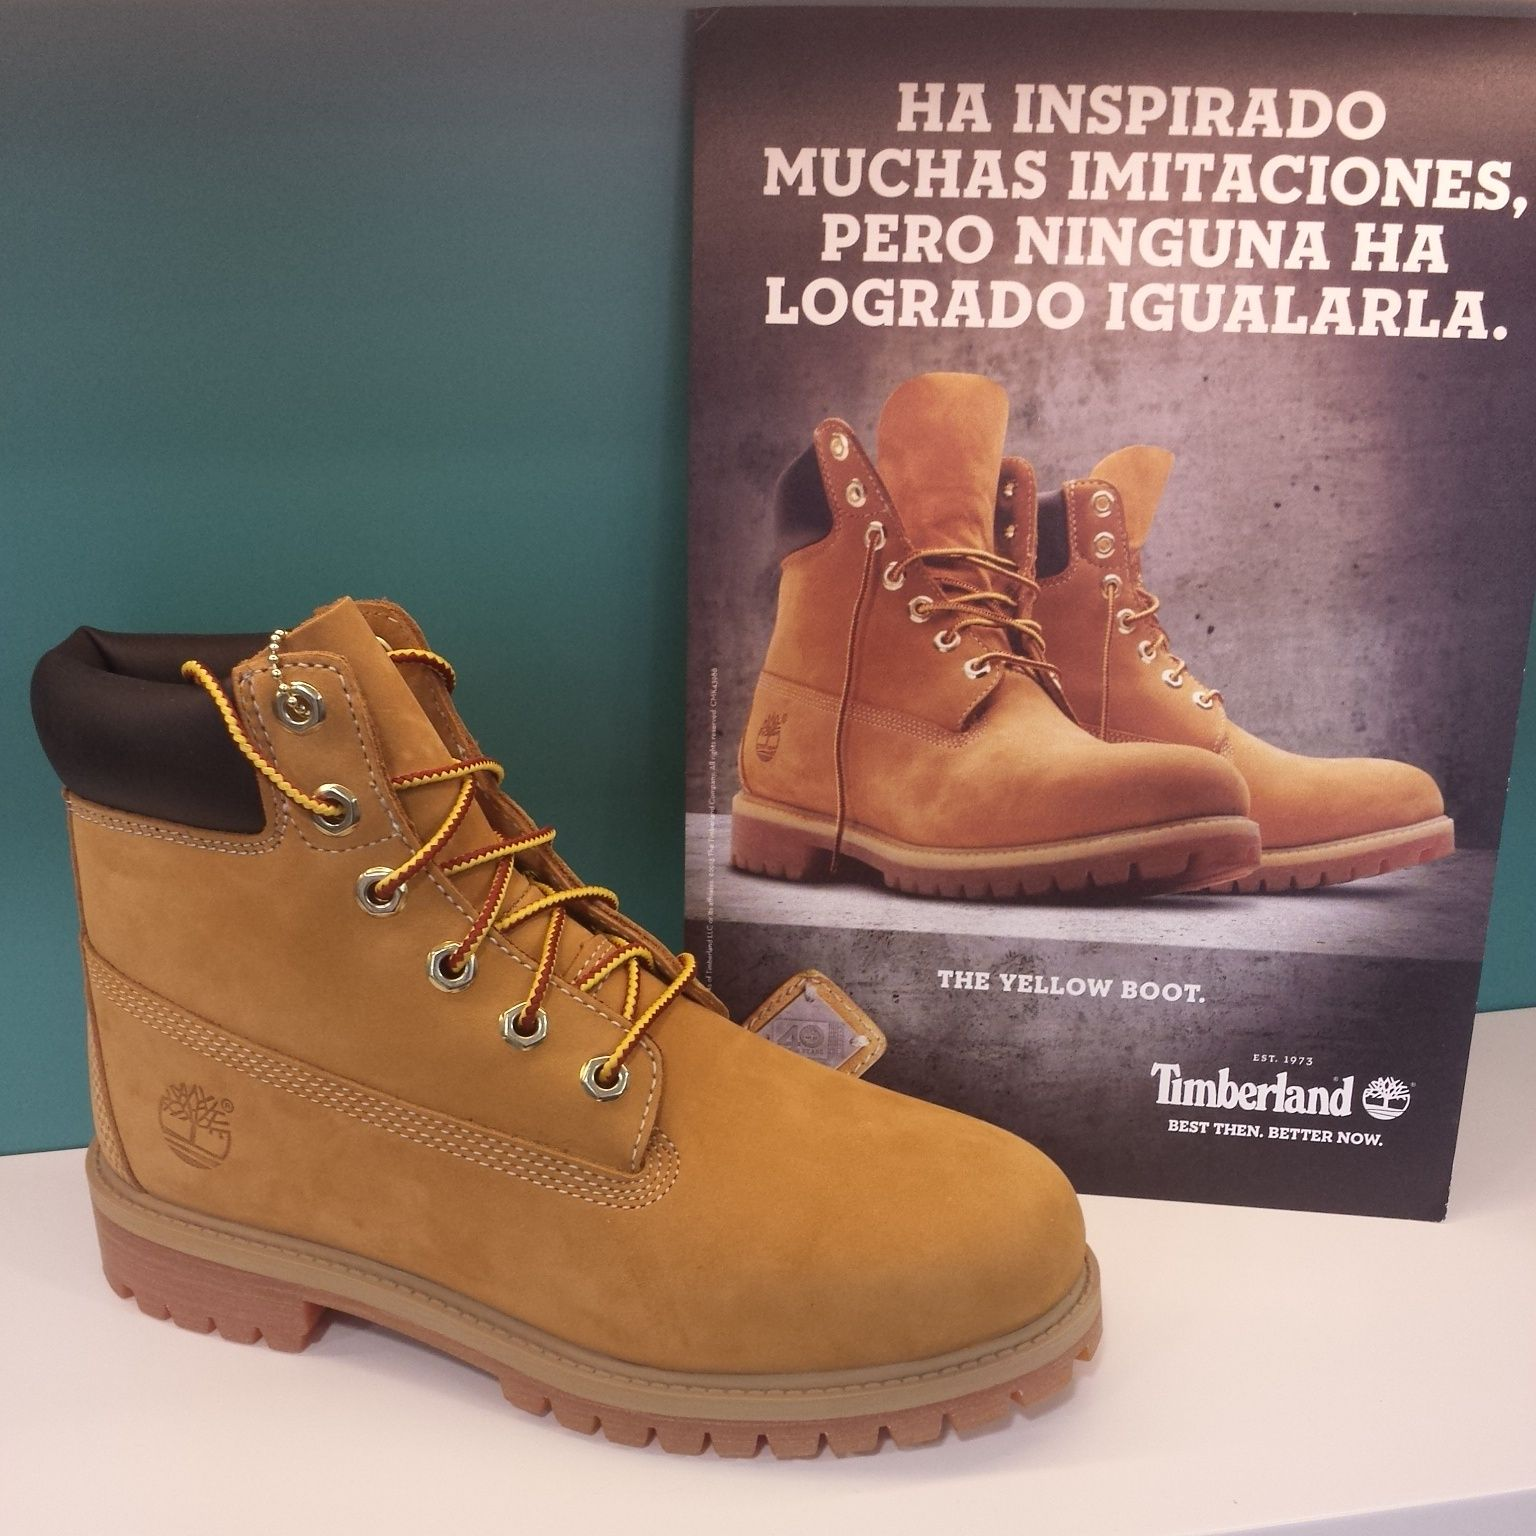 7324ce2293054 Timberland   la ORIGINAL bota amarilla   ha inspirado muchas imitaciones